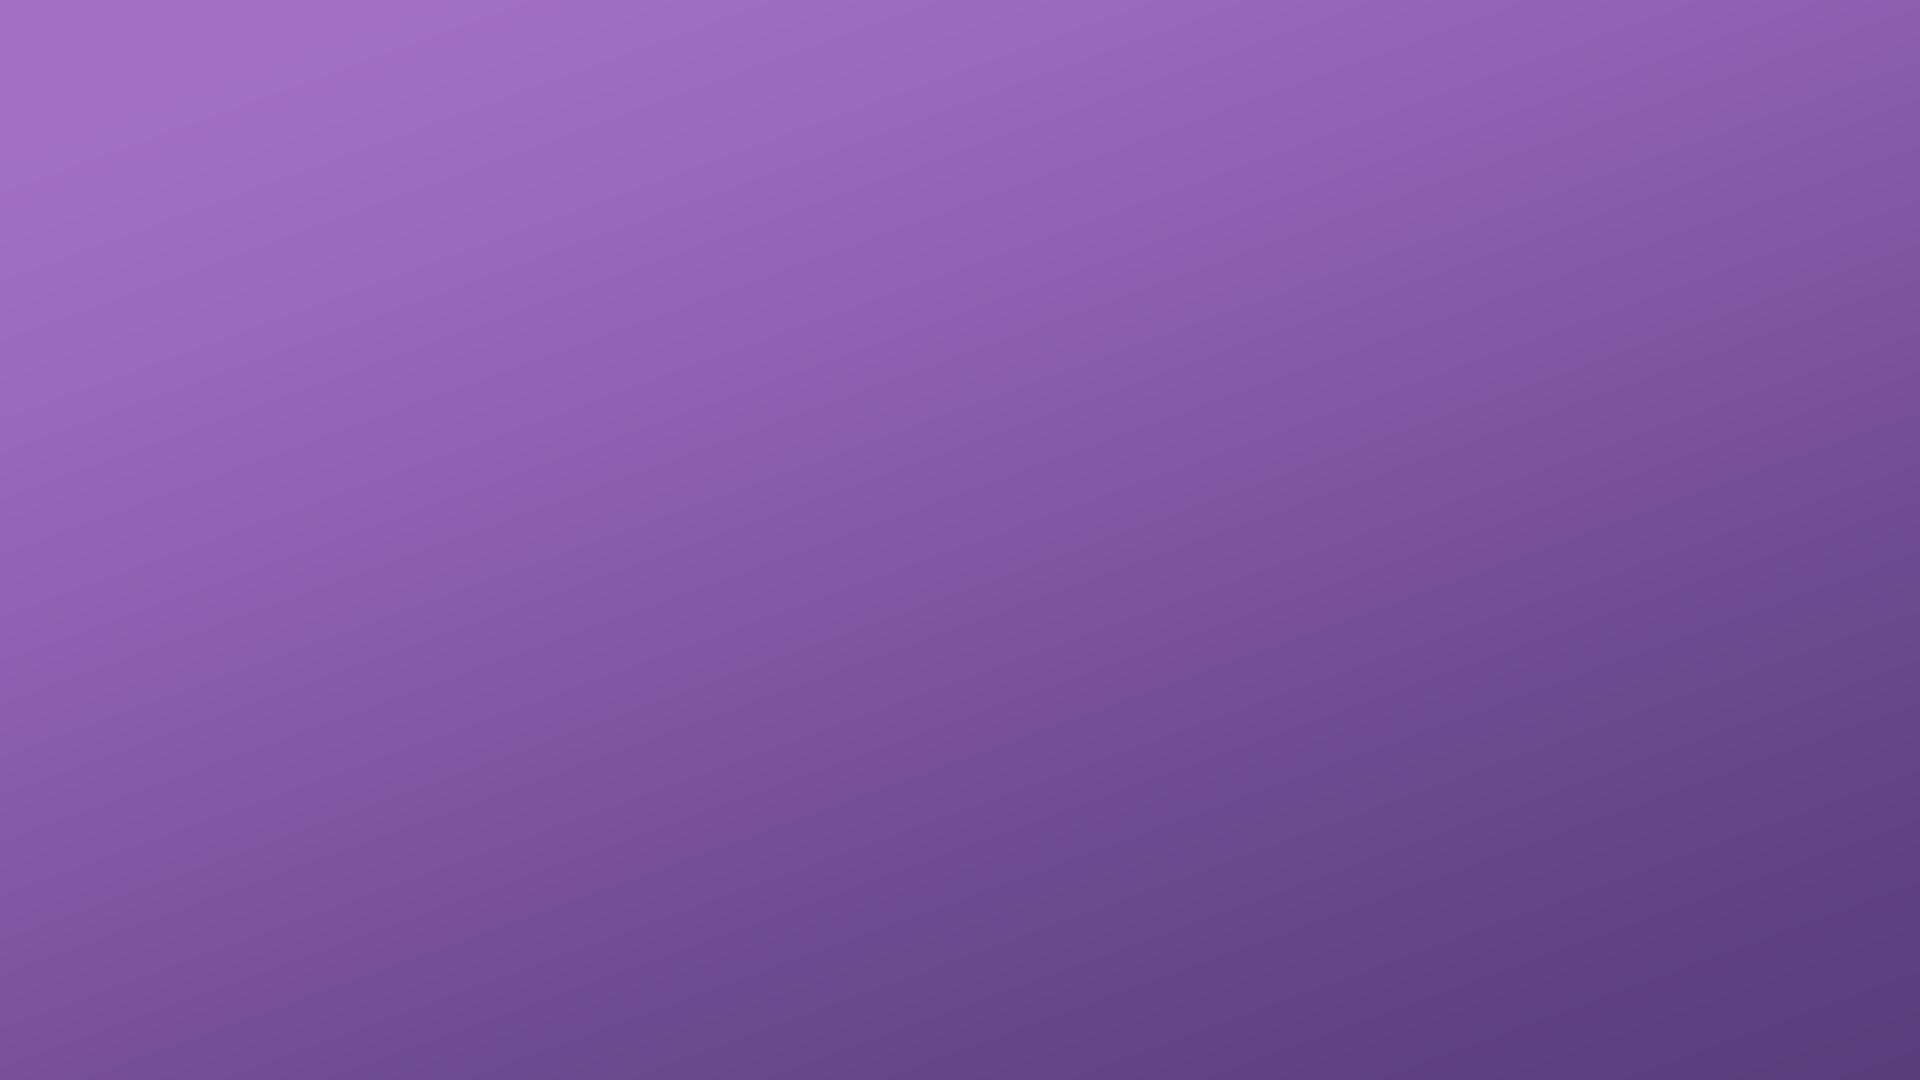 fondo-lila